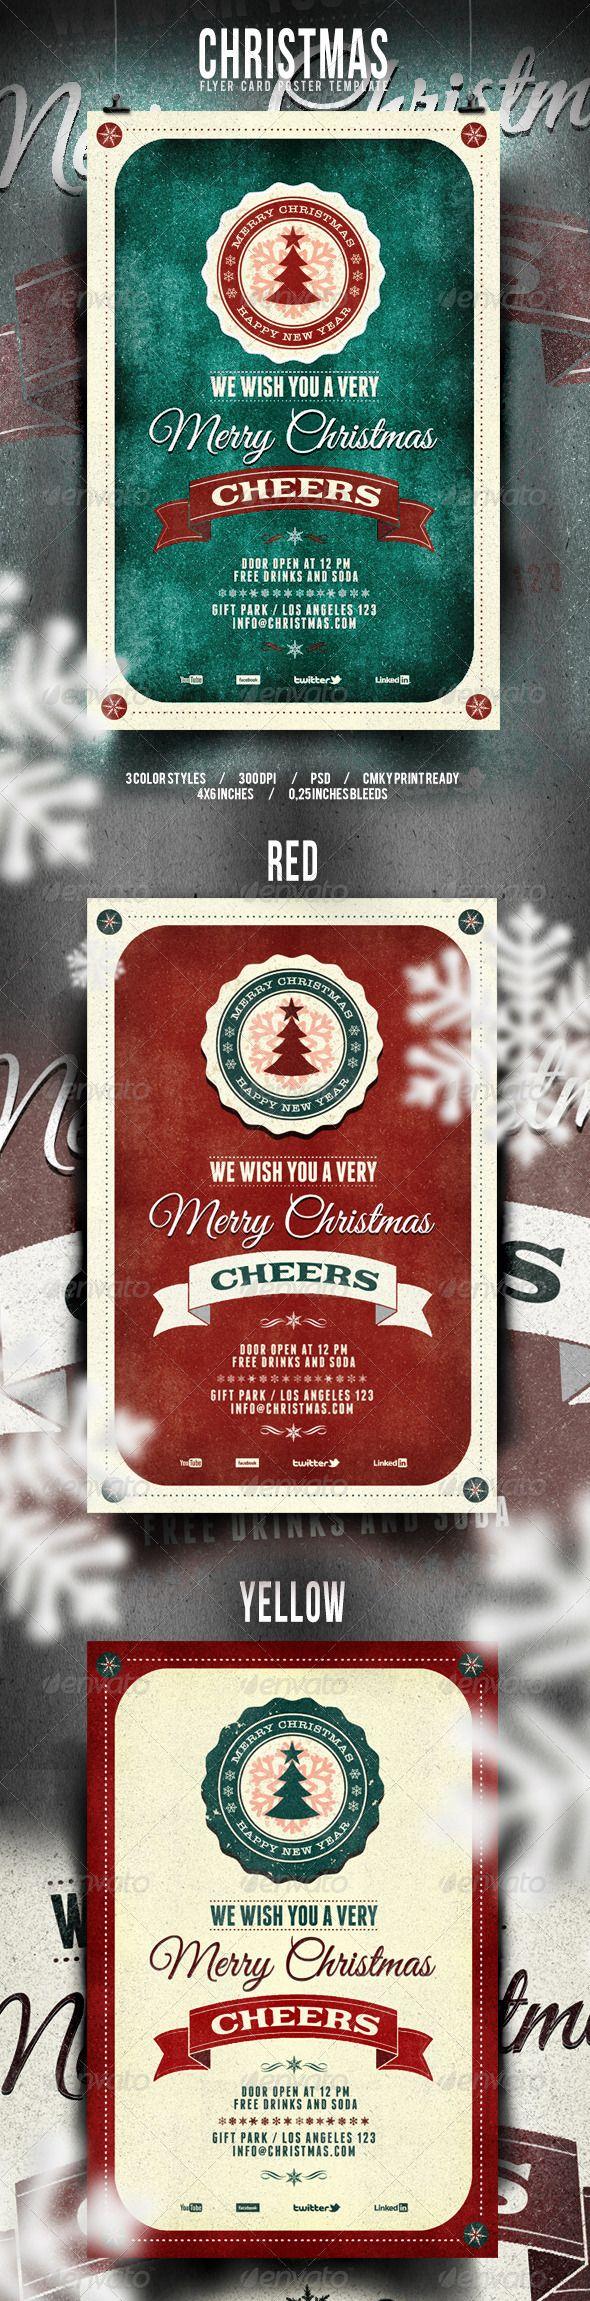 Christmas Flyer/Poster – Retro Vol. 3